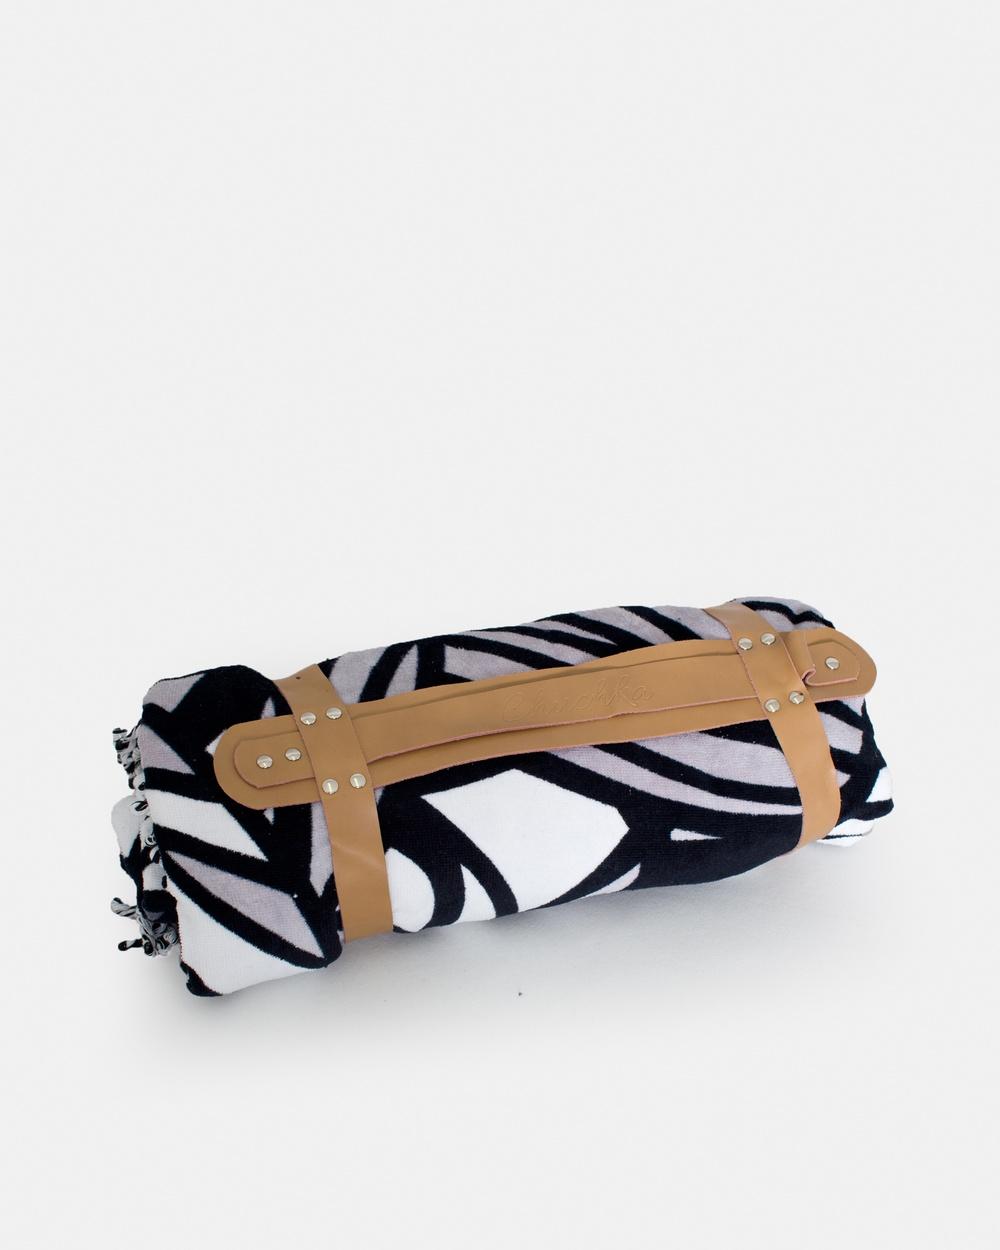 Chuchka Leather Carry Strap Tan Gym & Yoga brown